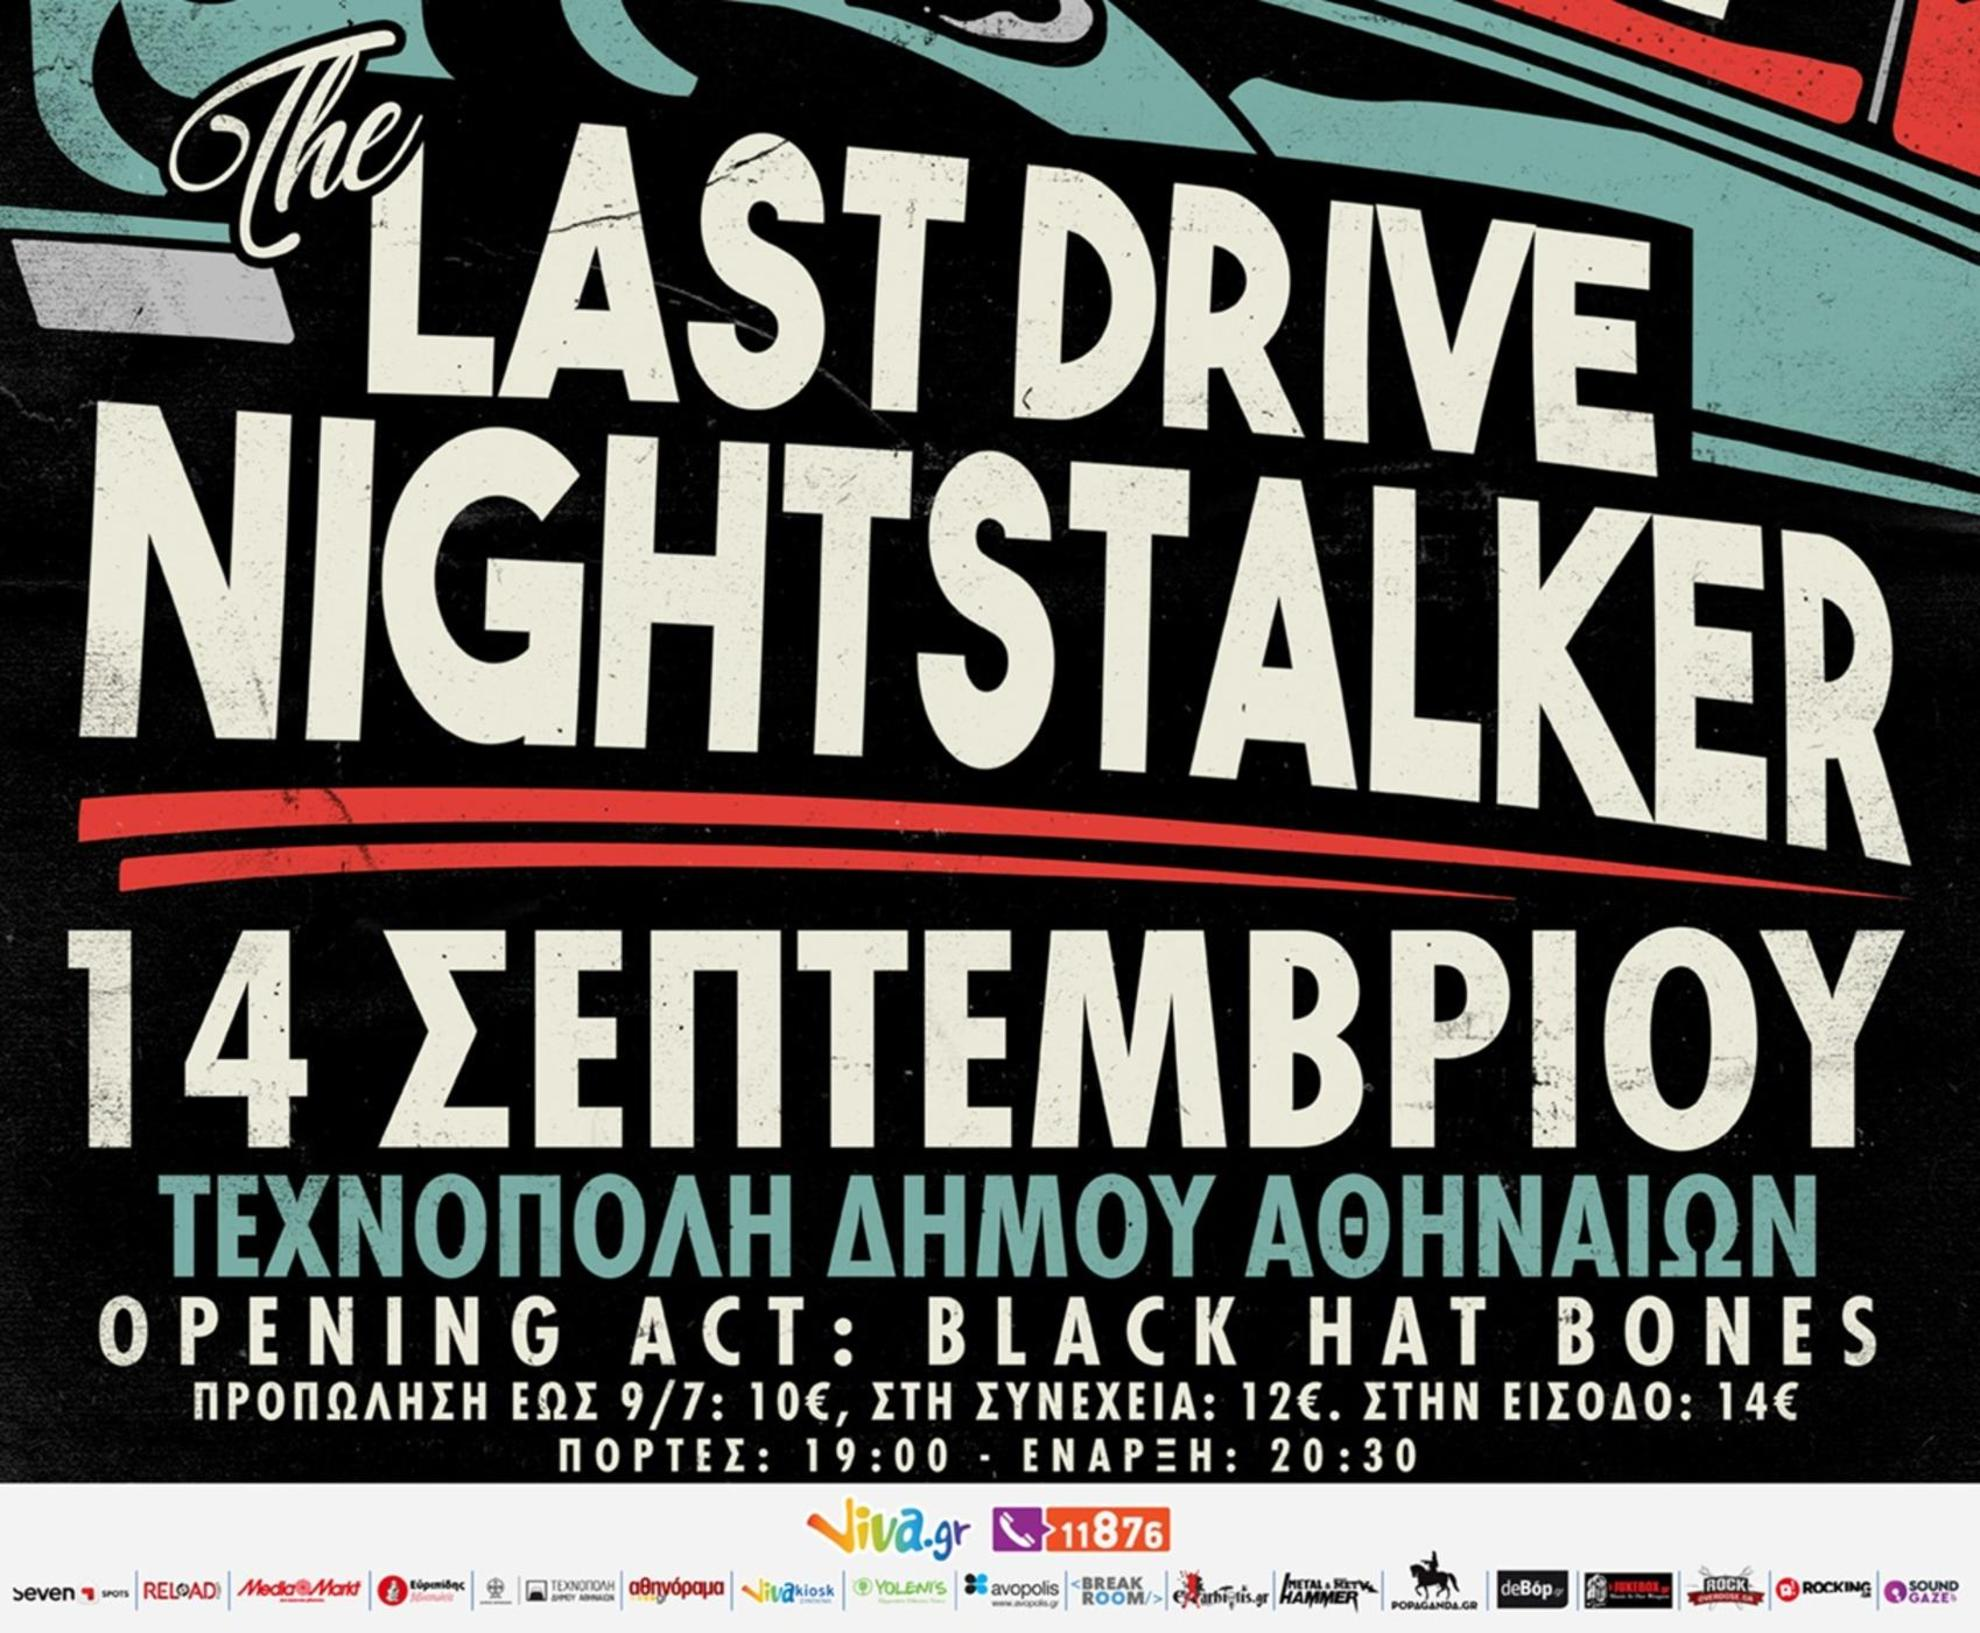 14.09.2018 – The Last Drive, Nightstalker / Opening act: Black Hat Bones